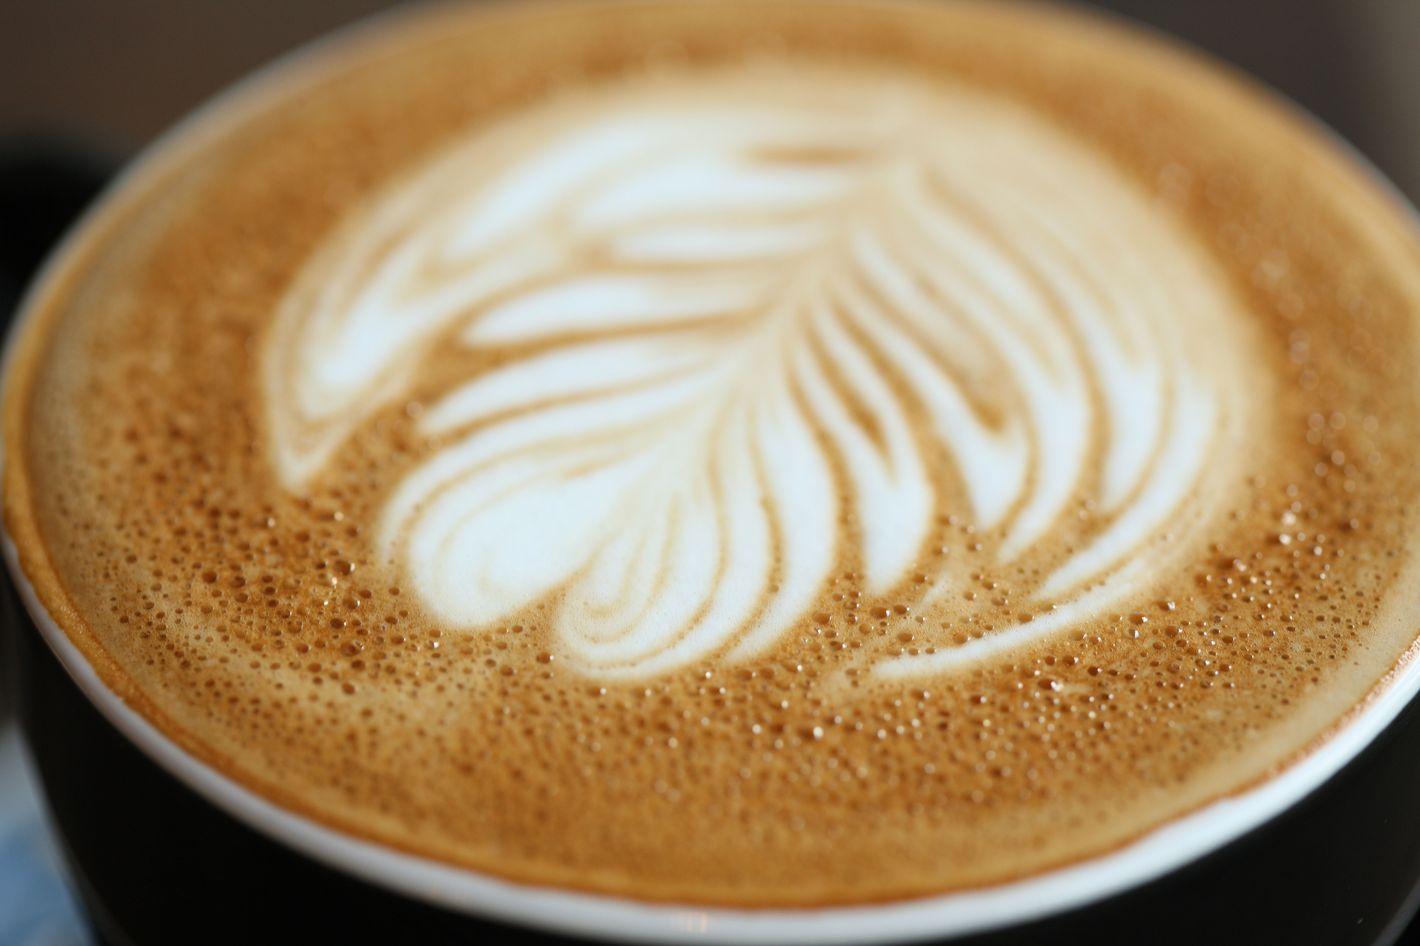 http://pixel.nymag.com/imgs/daily/grub/2013/09/10/10-tobys-estate-coffee.jpg